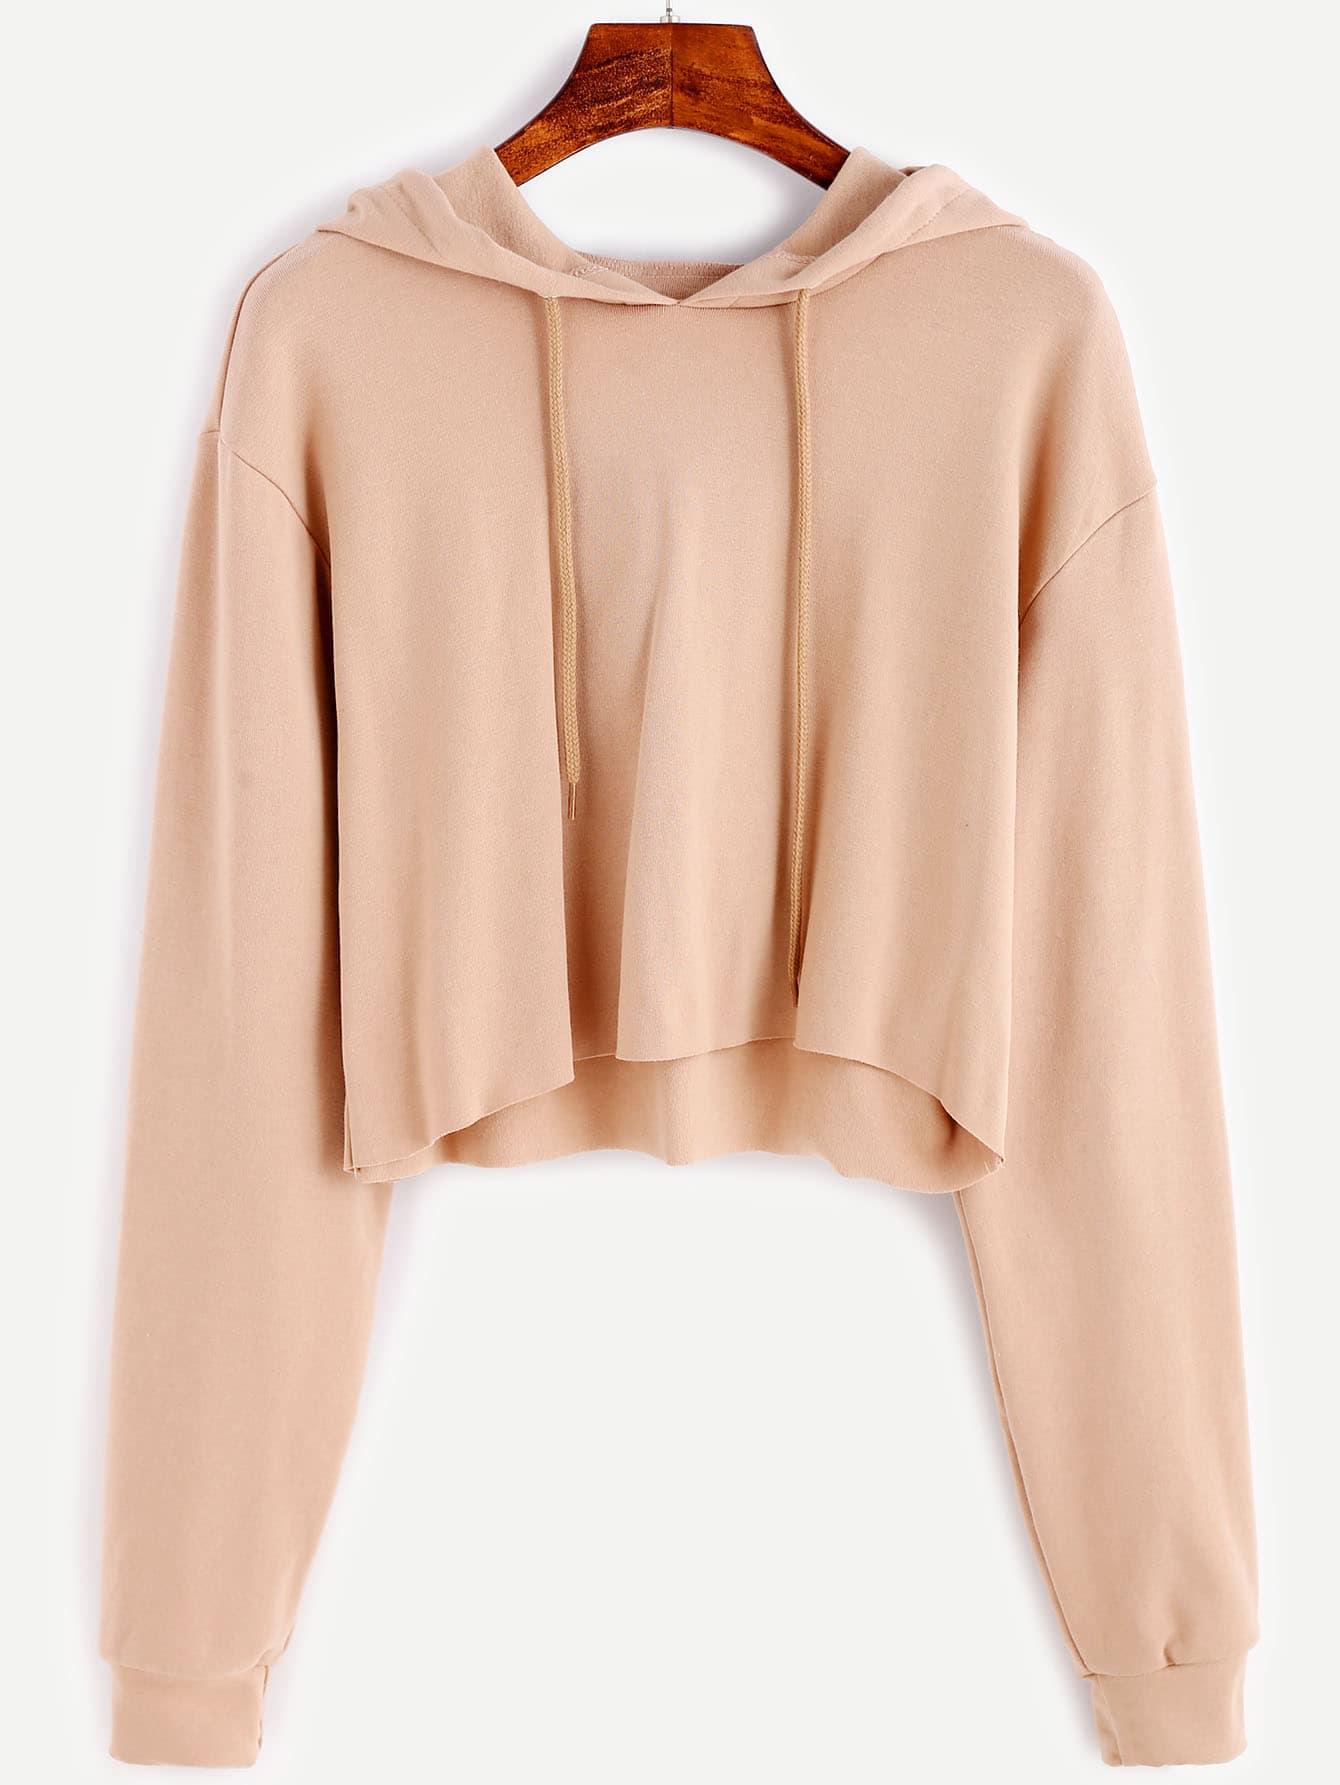 dbc9c21734f Apricot Drawstring Hooded Crop Sweatshirt